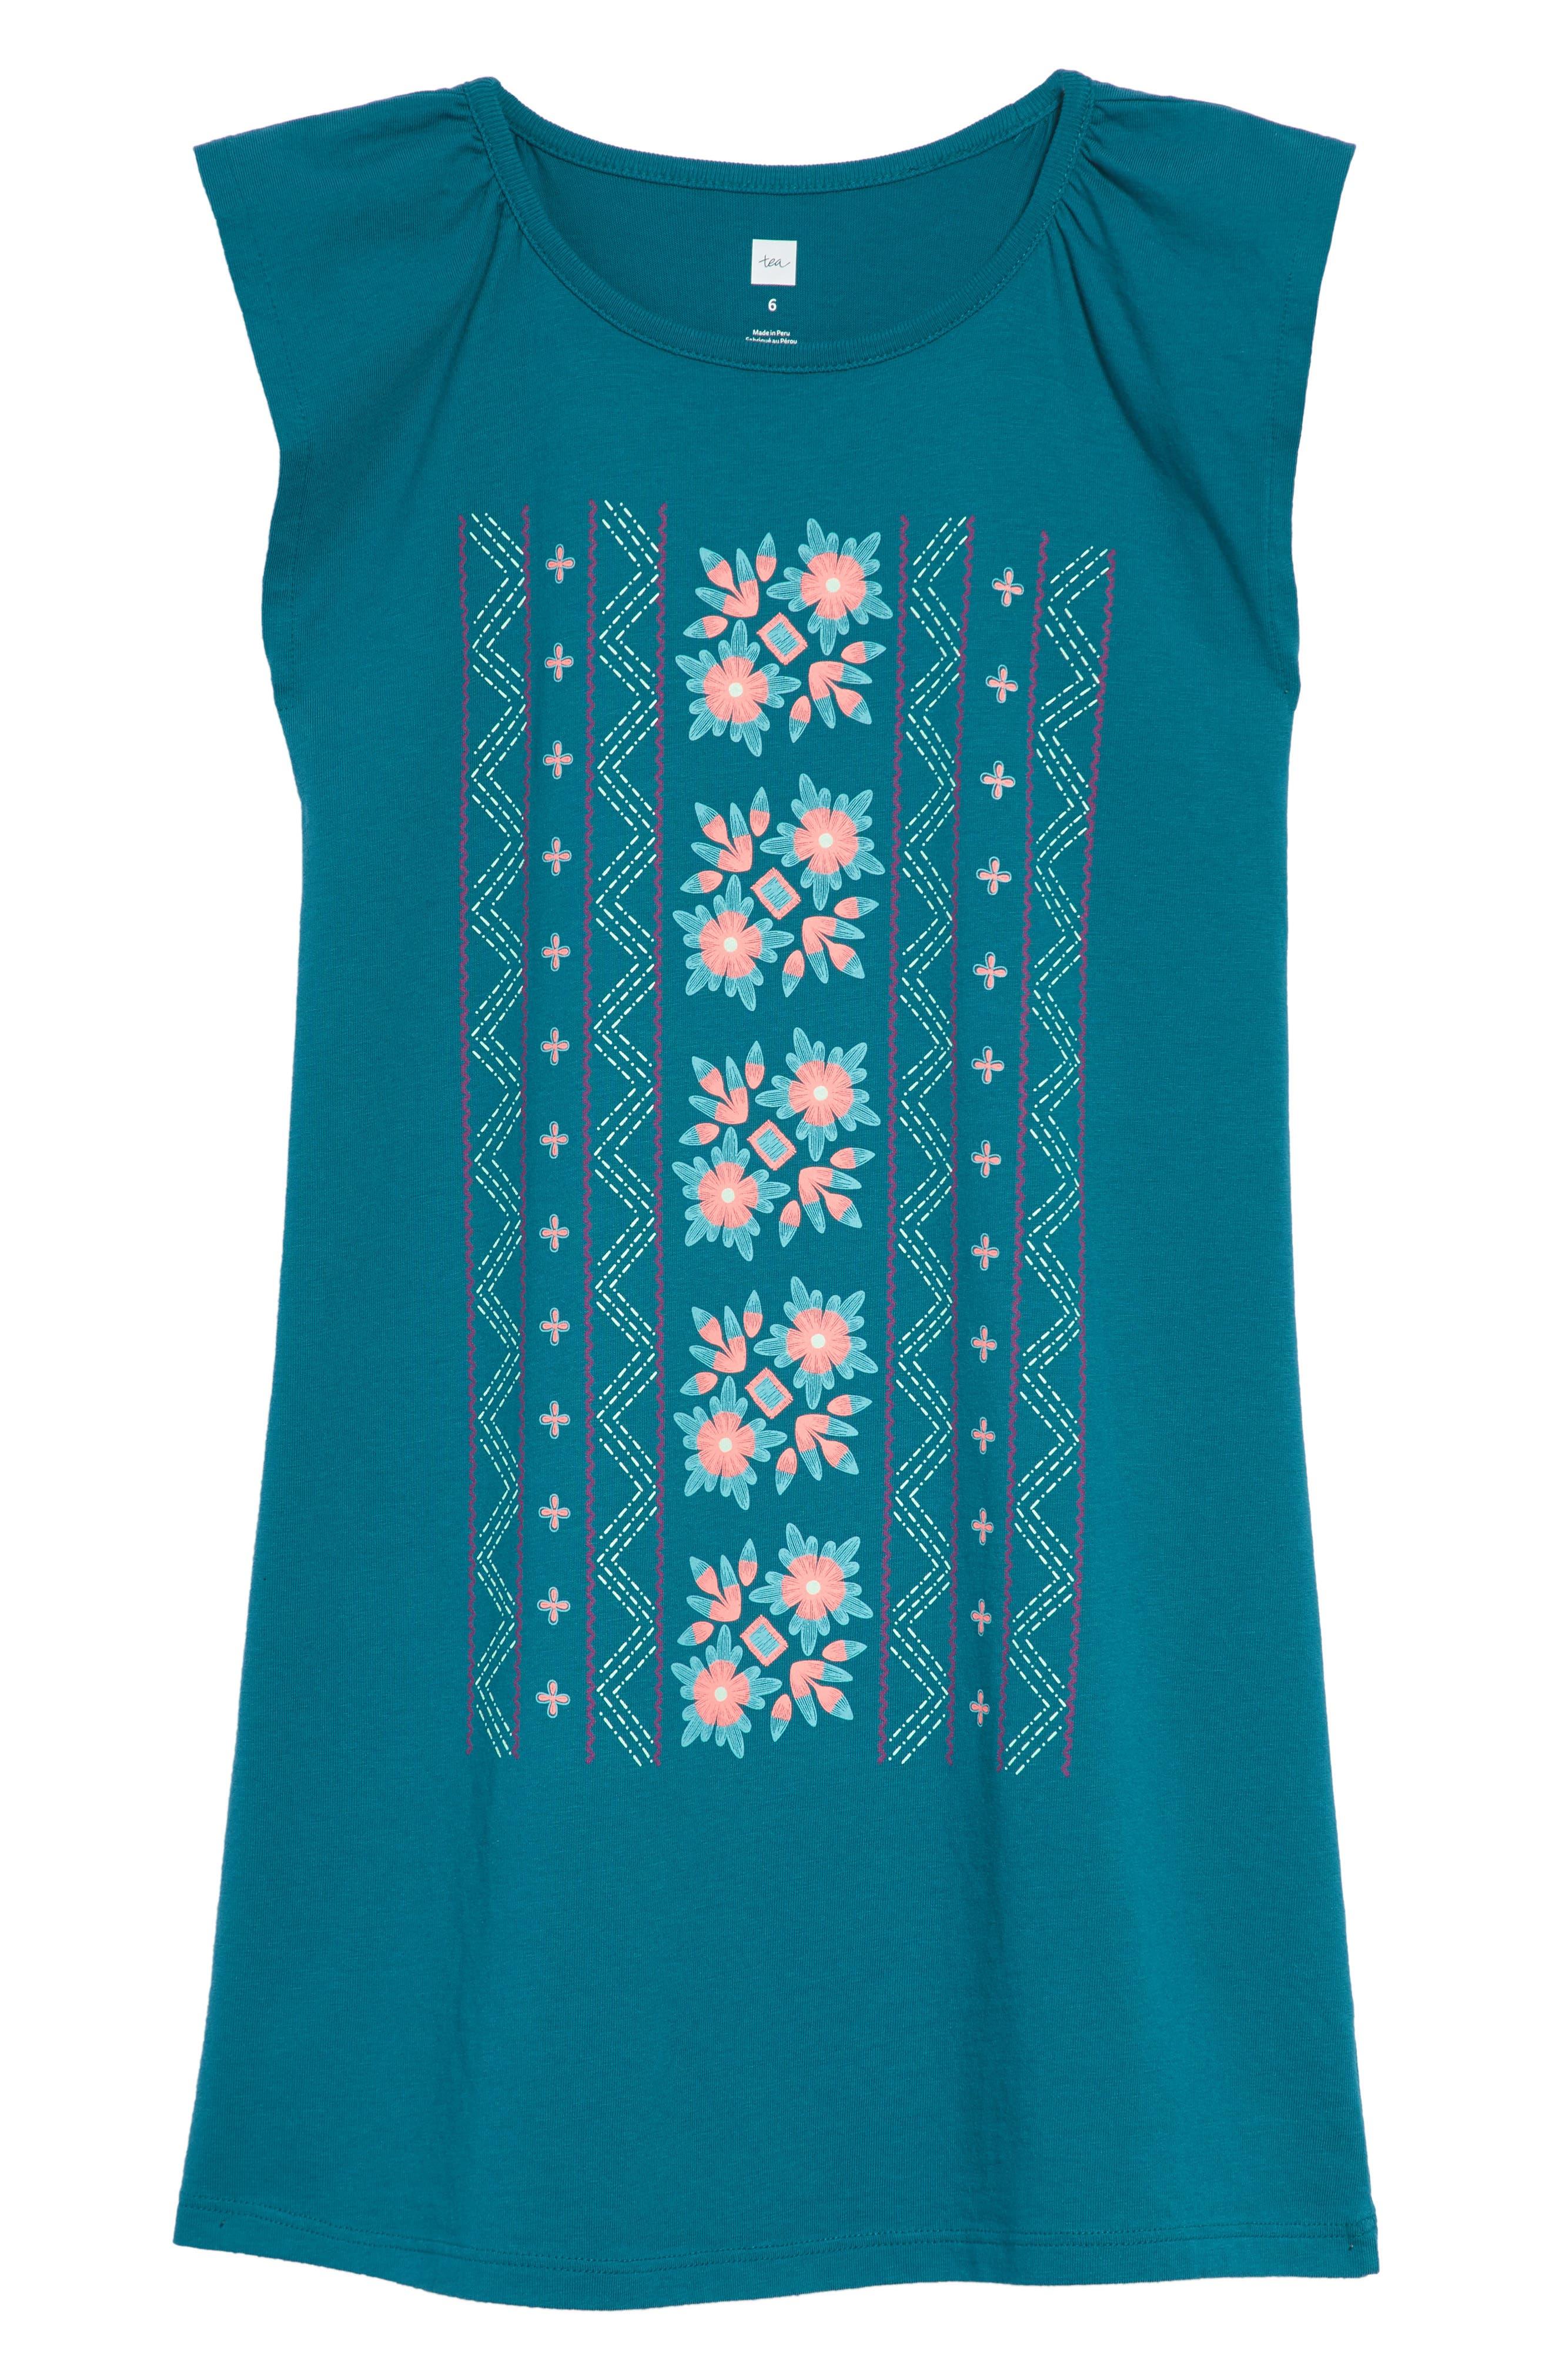 TEA COLLECTION,                             Floral Graphic Dress,                             Main thumbnail 1, color,                             446